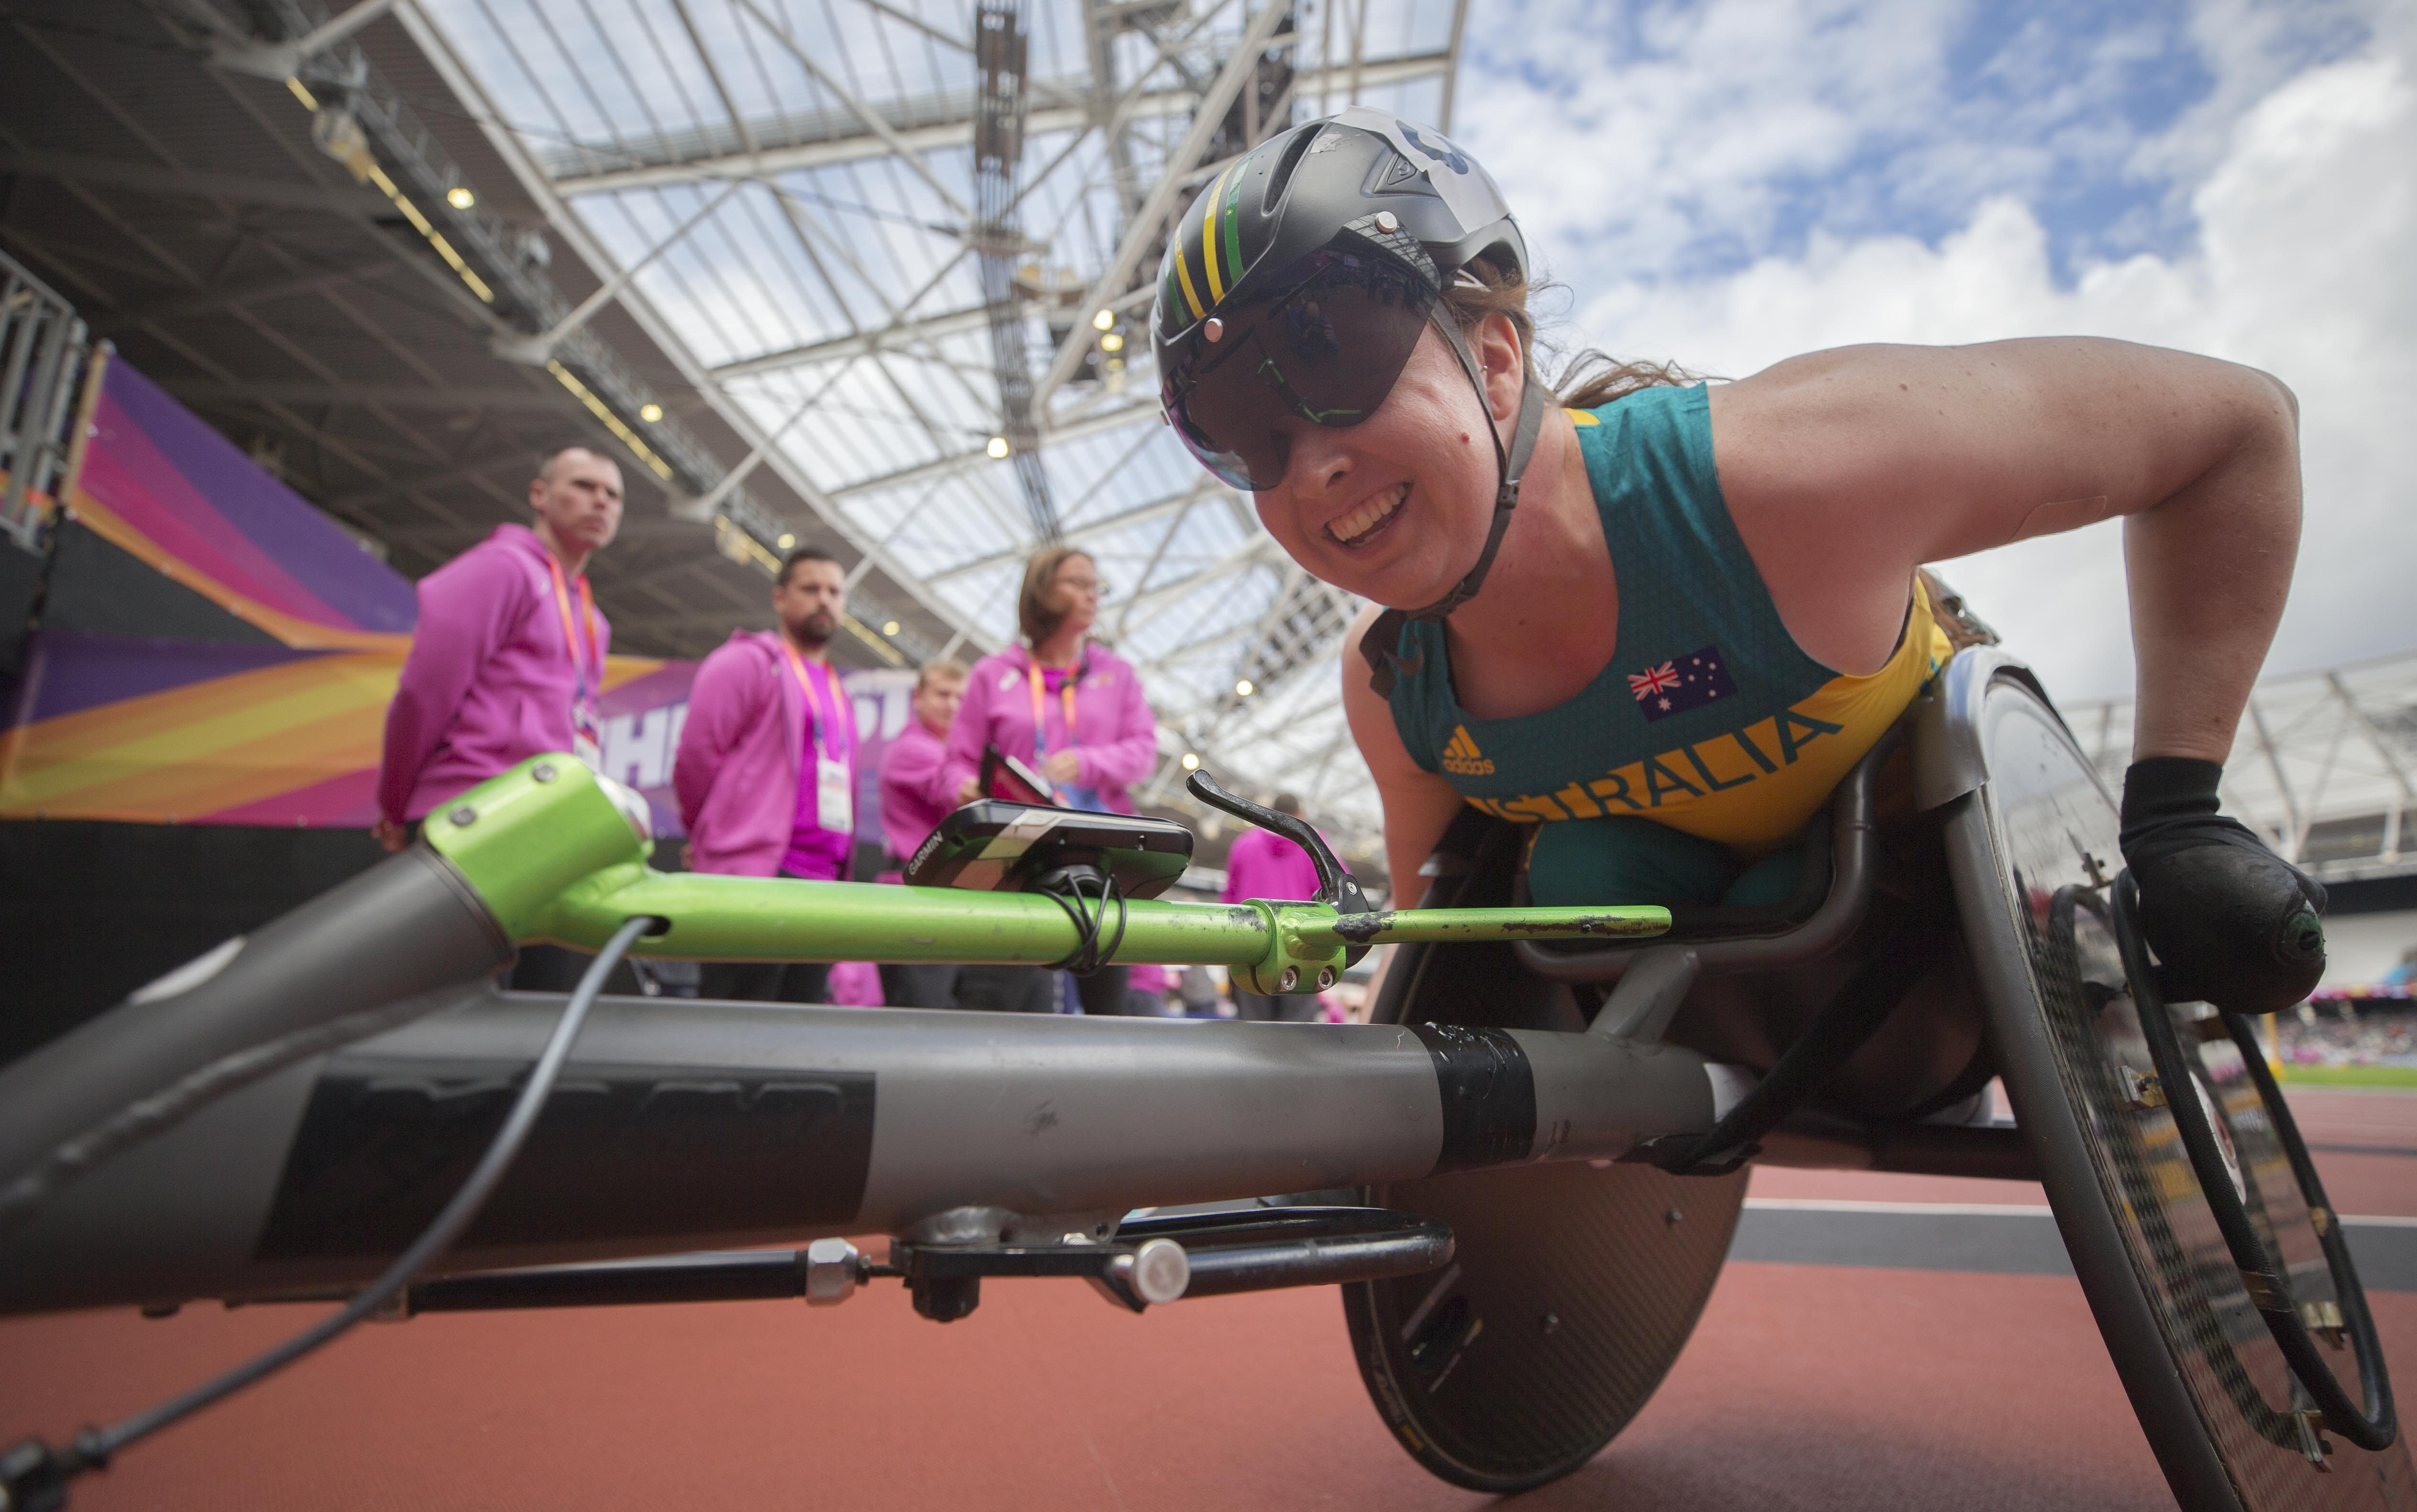 Three athletes down, but Australian team ready to go in Dubai